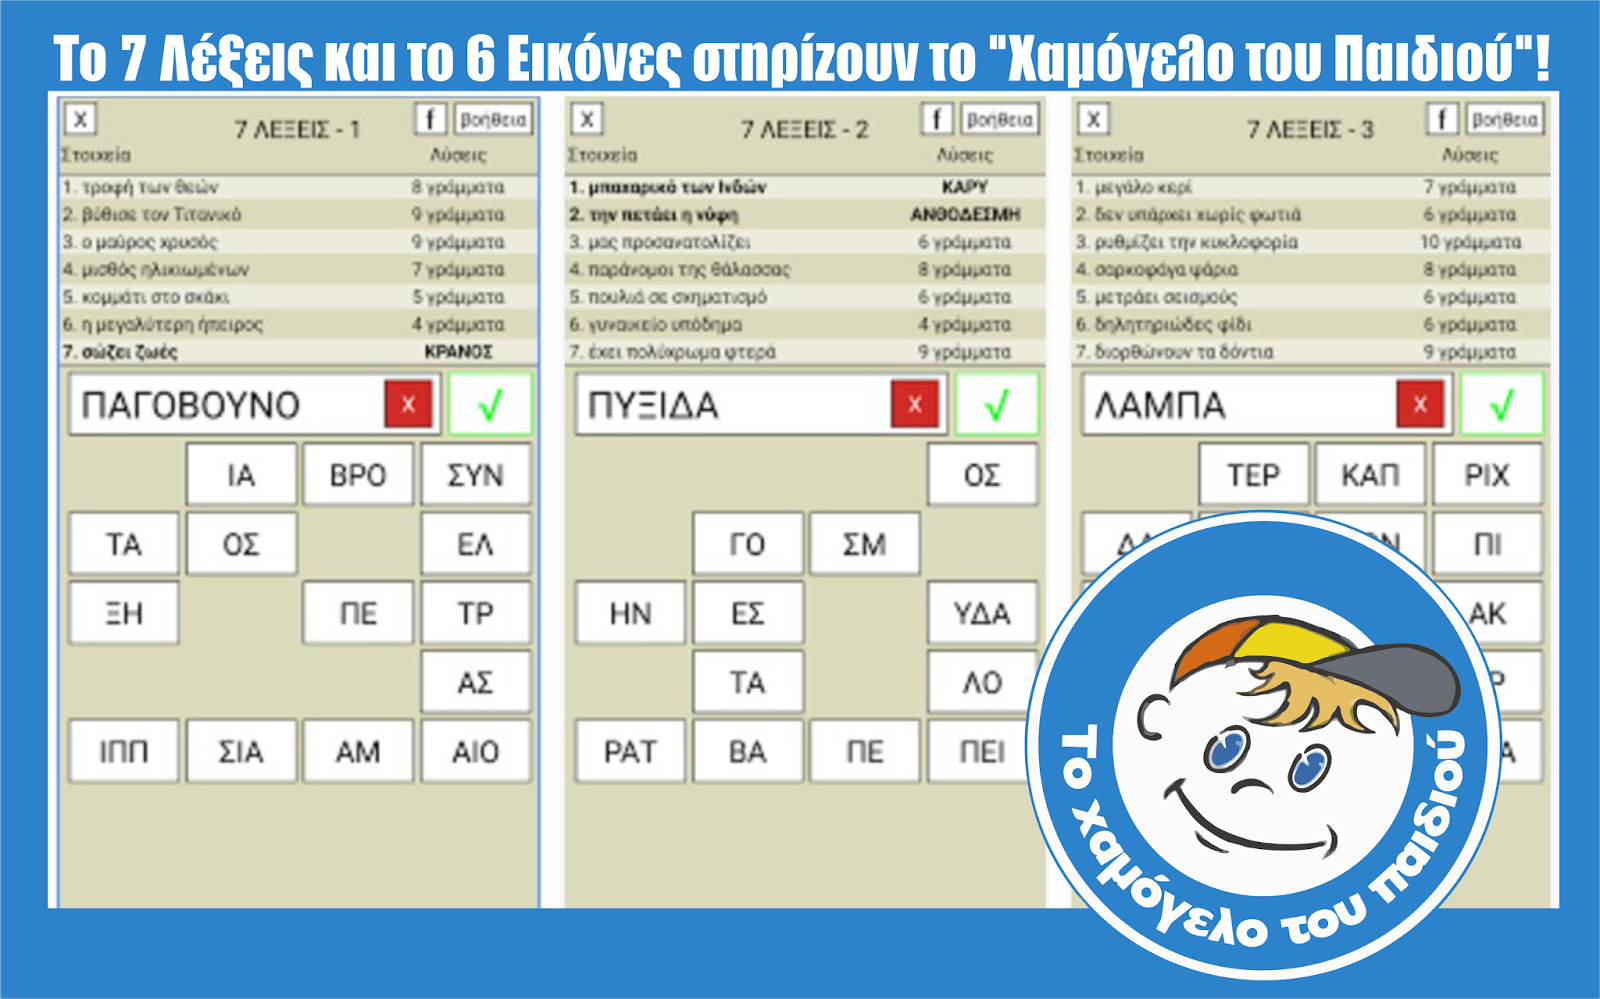 http://www.ekriti.gr/sites/default/files/thumbnails/image/hamogelo.png